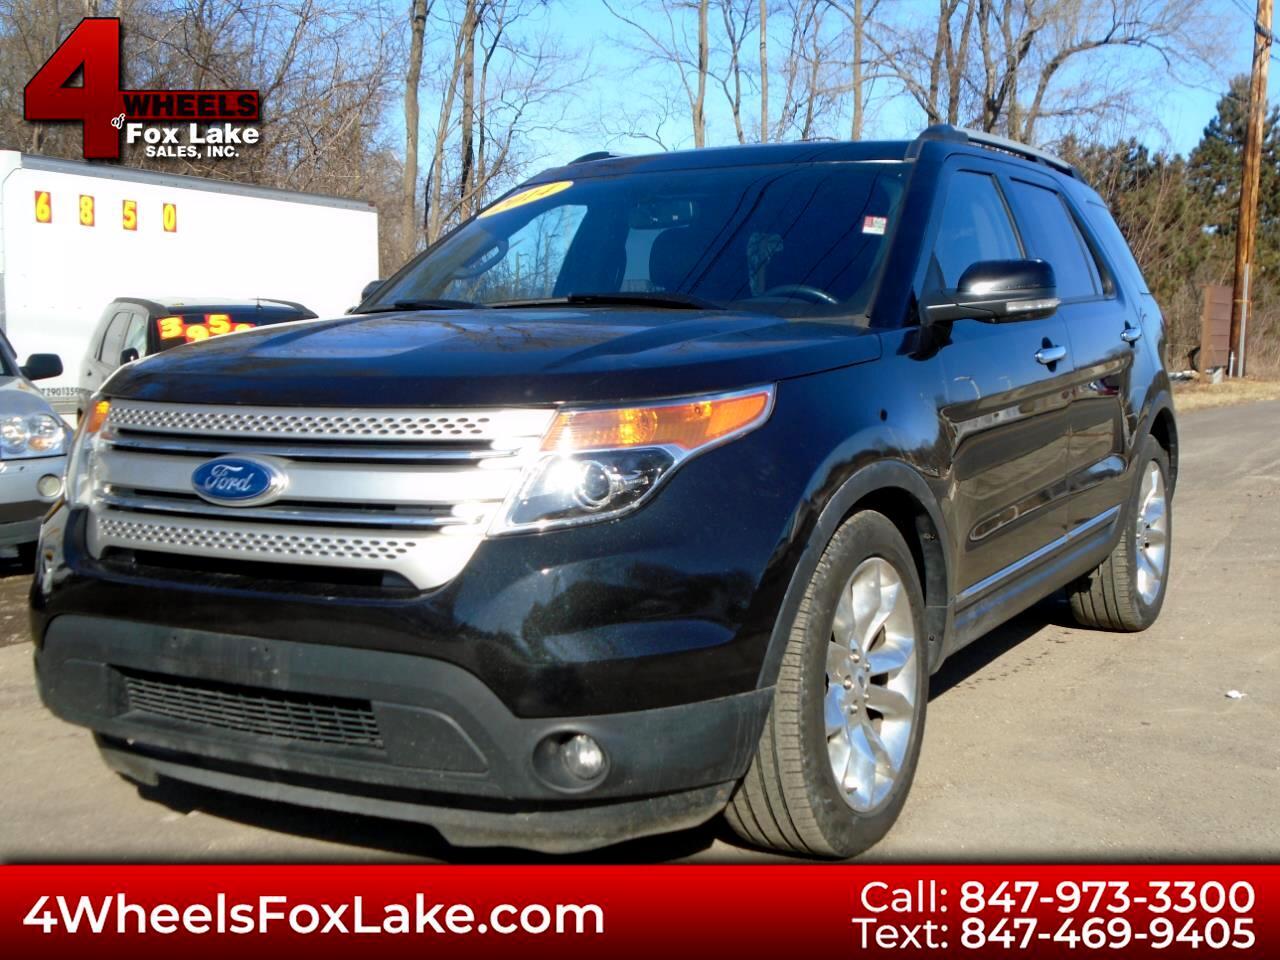 Ford Explorer XLT FWD 2014